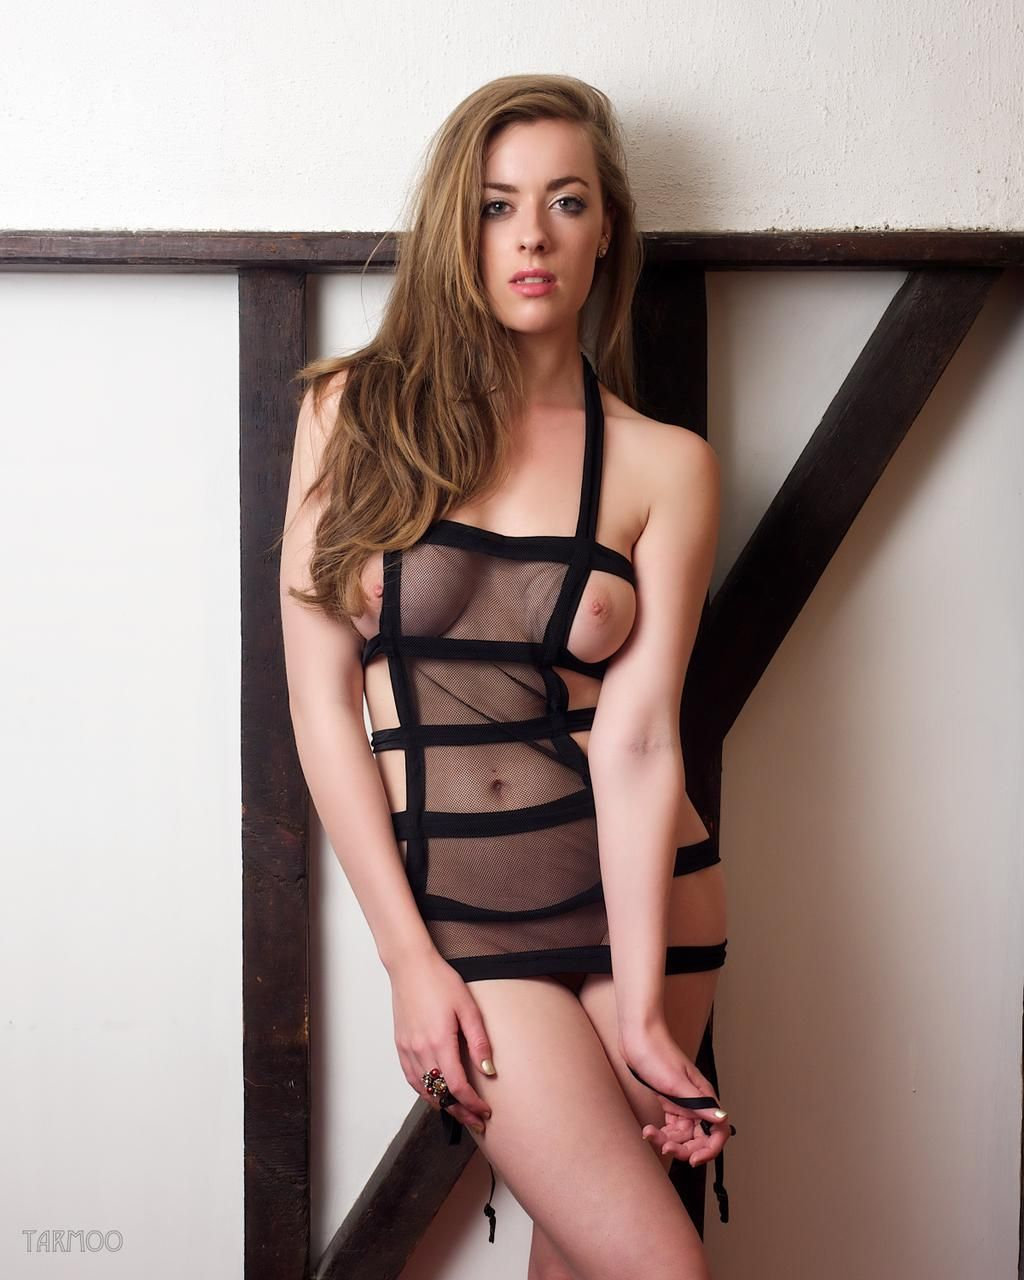 Erotica Abigail Ratchford naked (22 photos), Ass, Leaked, Feet, panties 2018